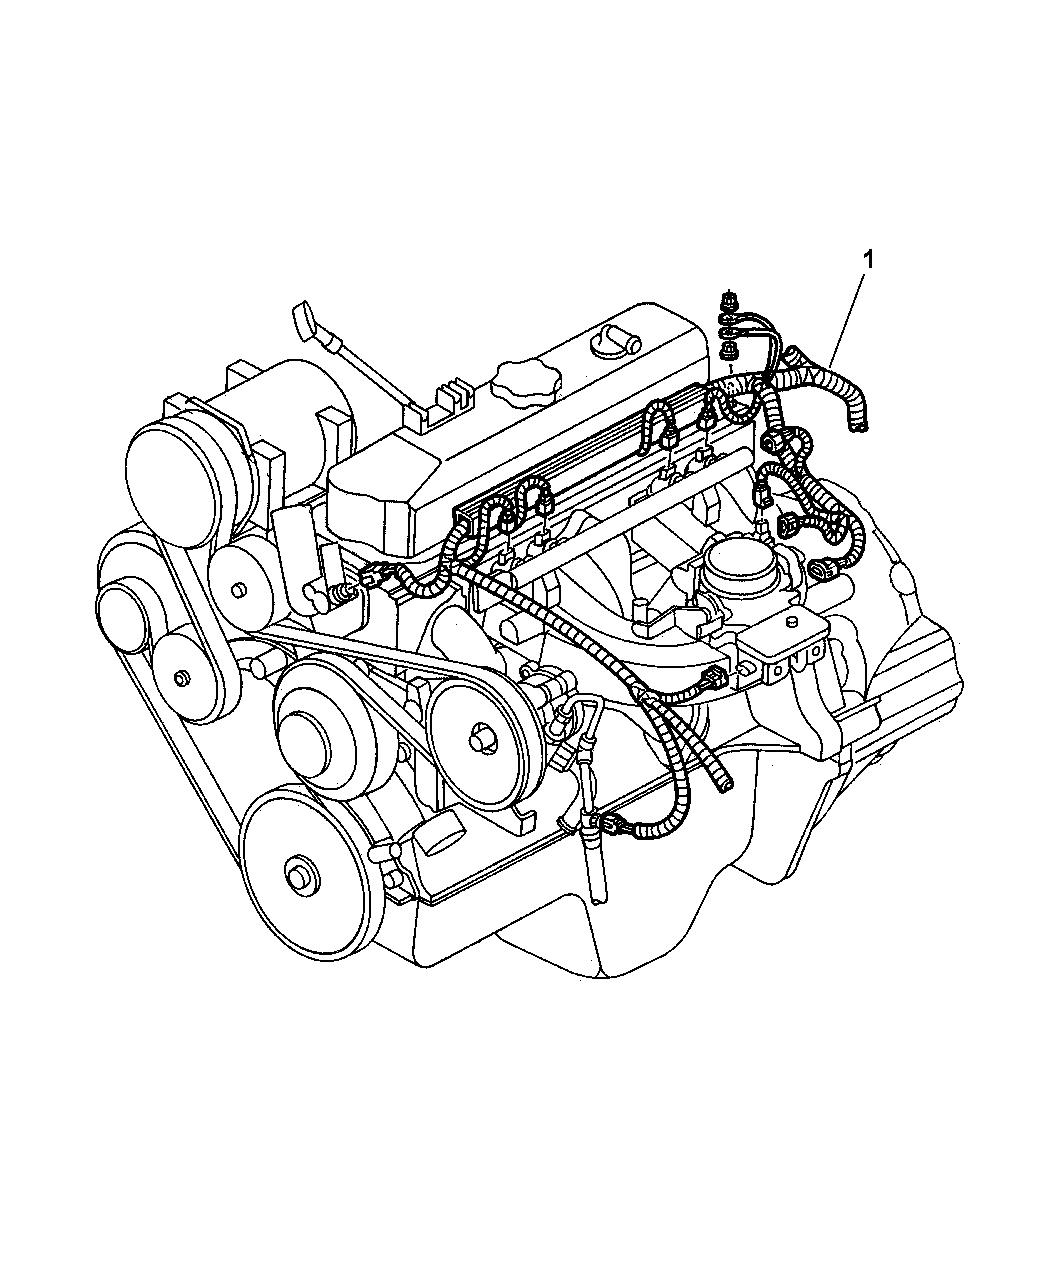 2003 Dodge Dakota Wiring